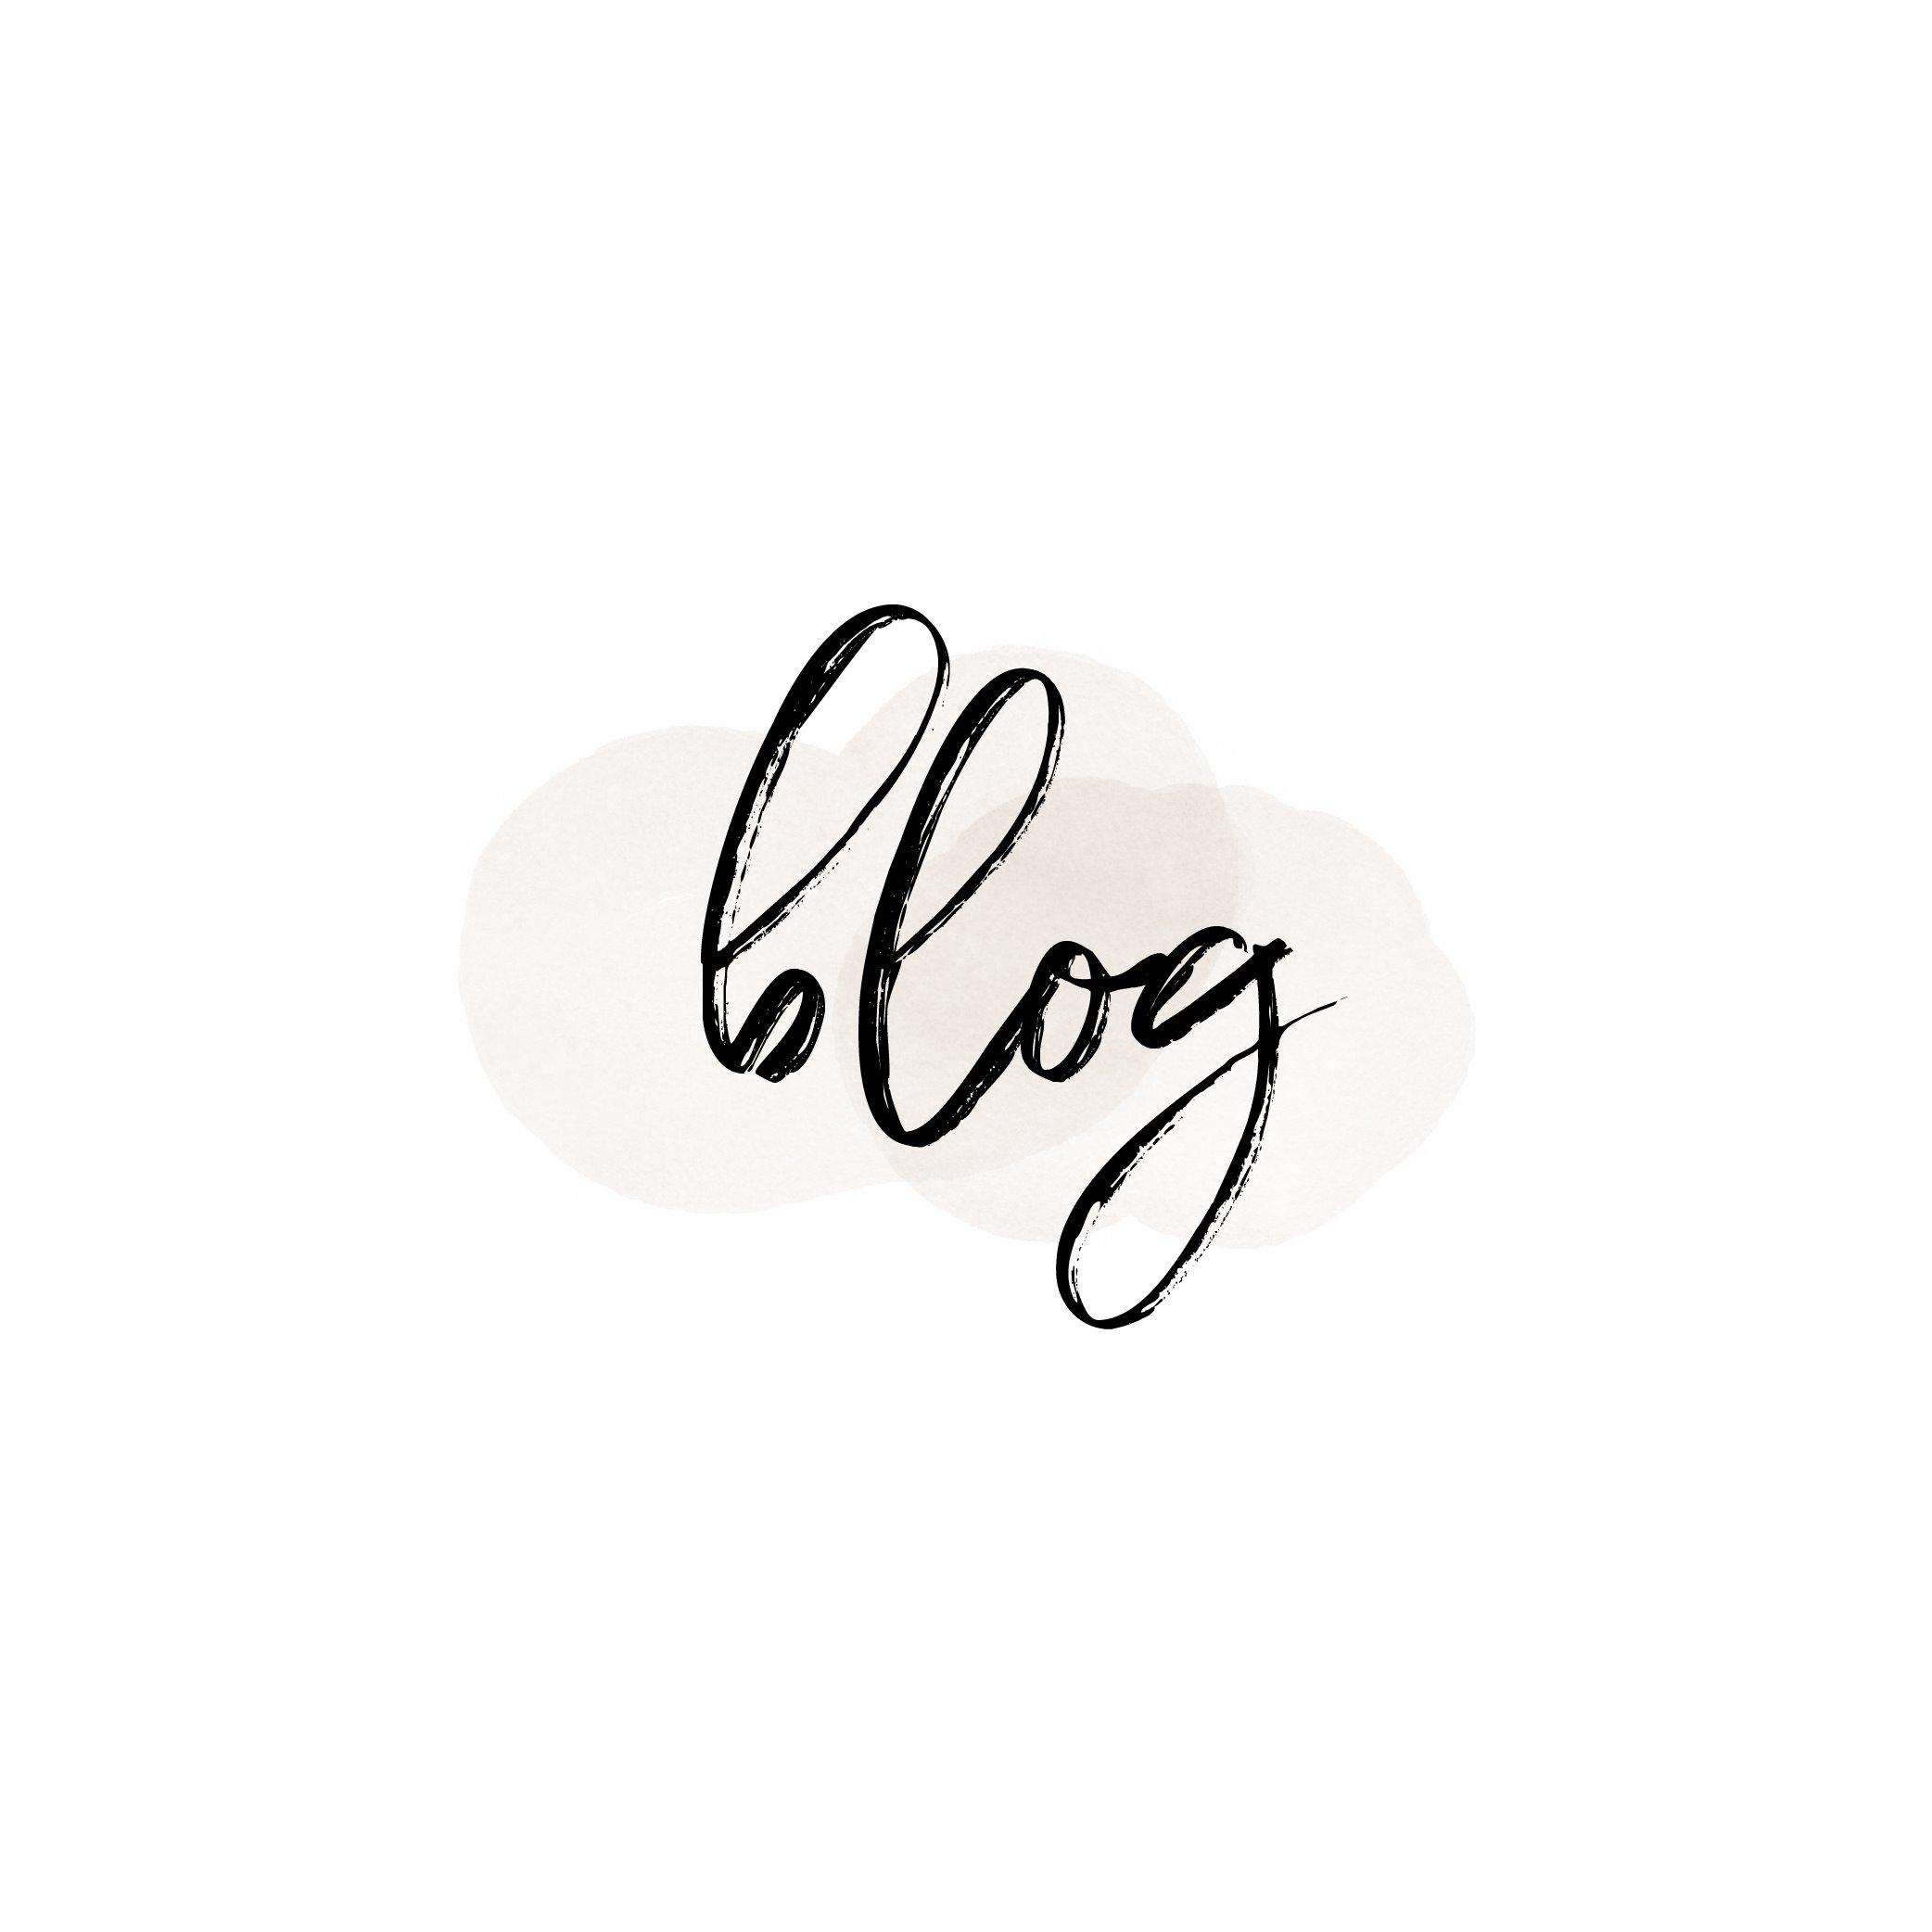 @Morganalanna All My Words Link Thumbnail | Linktree